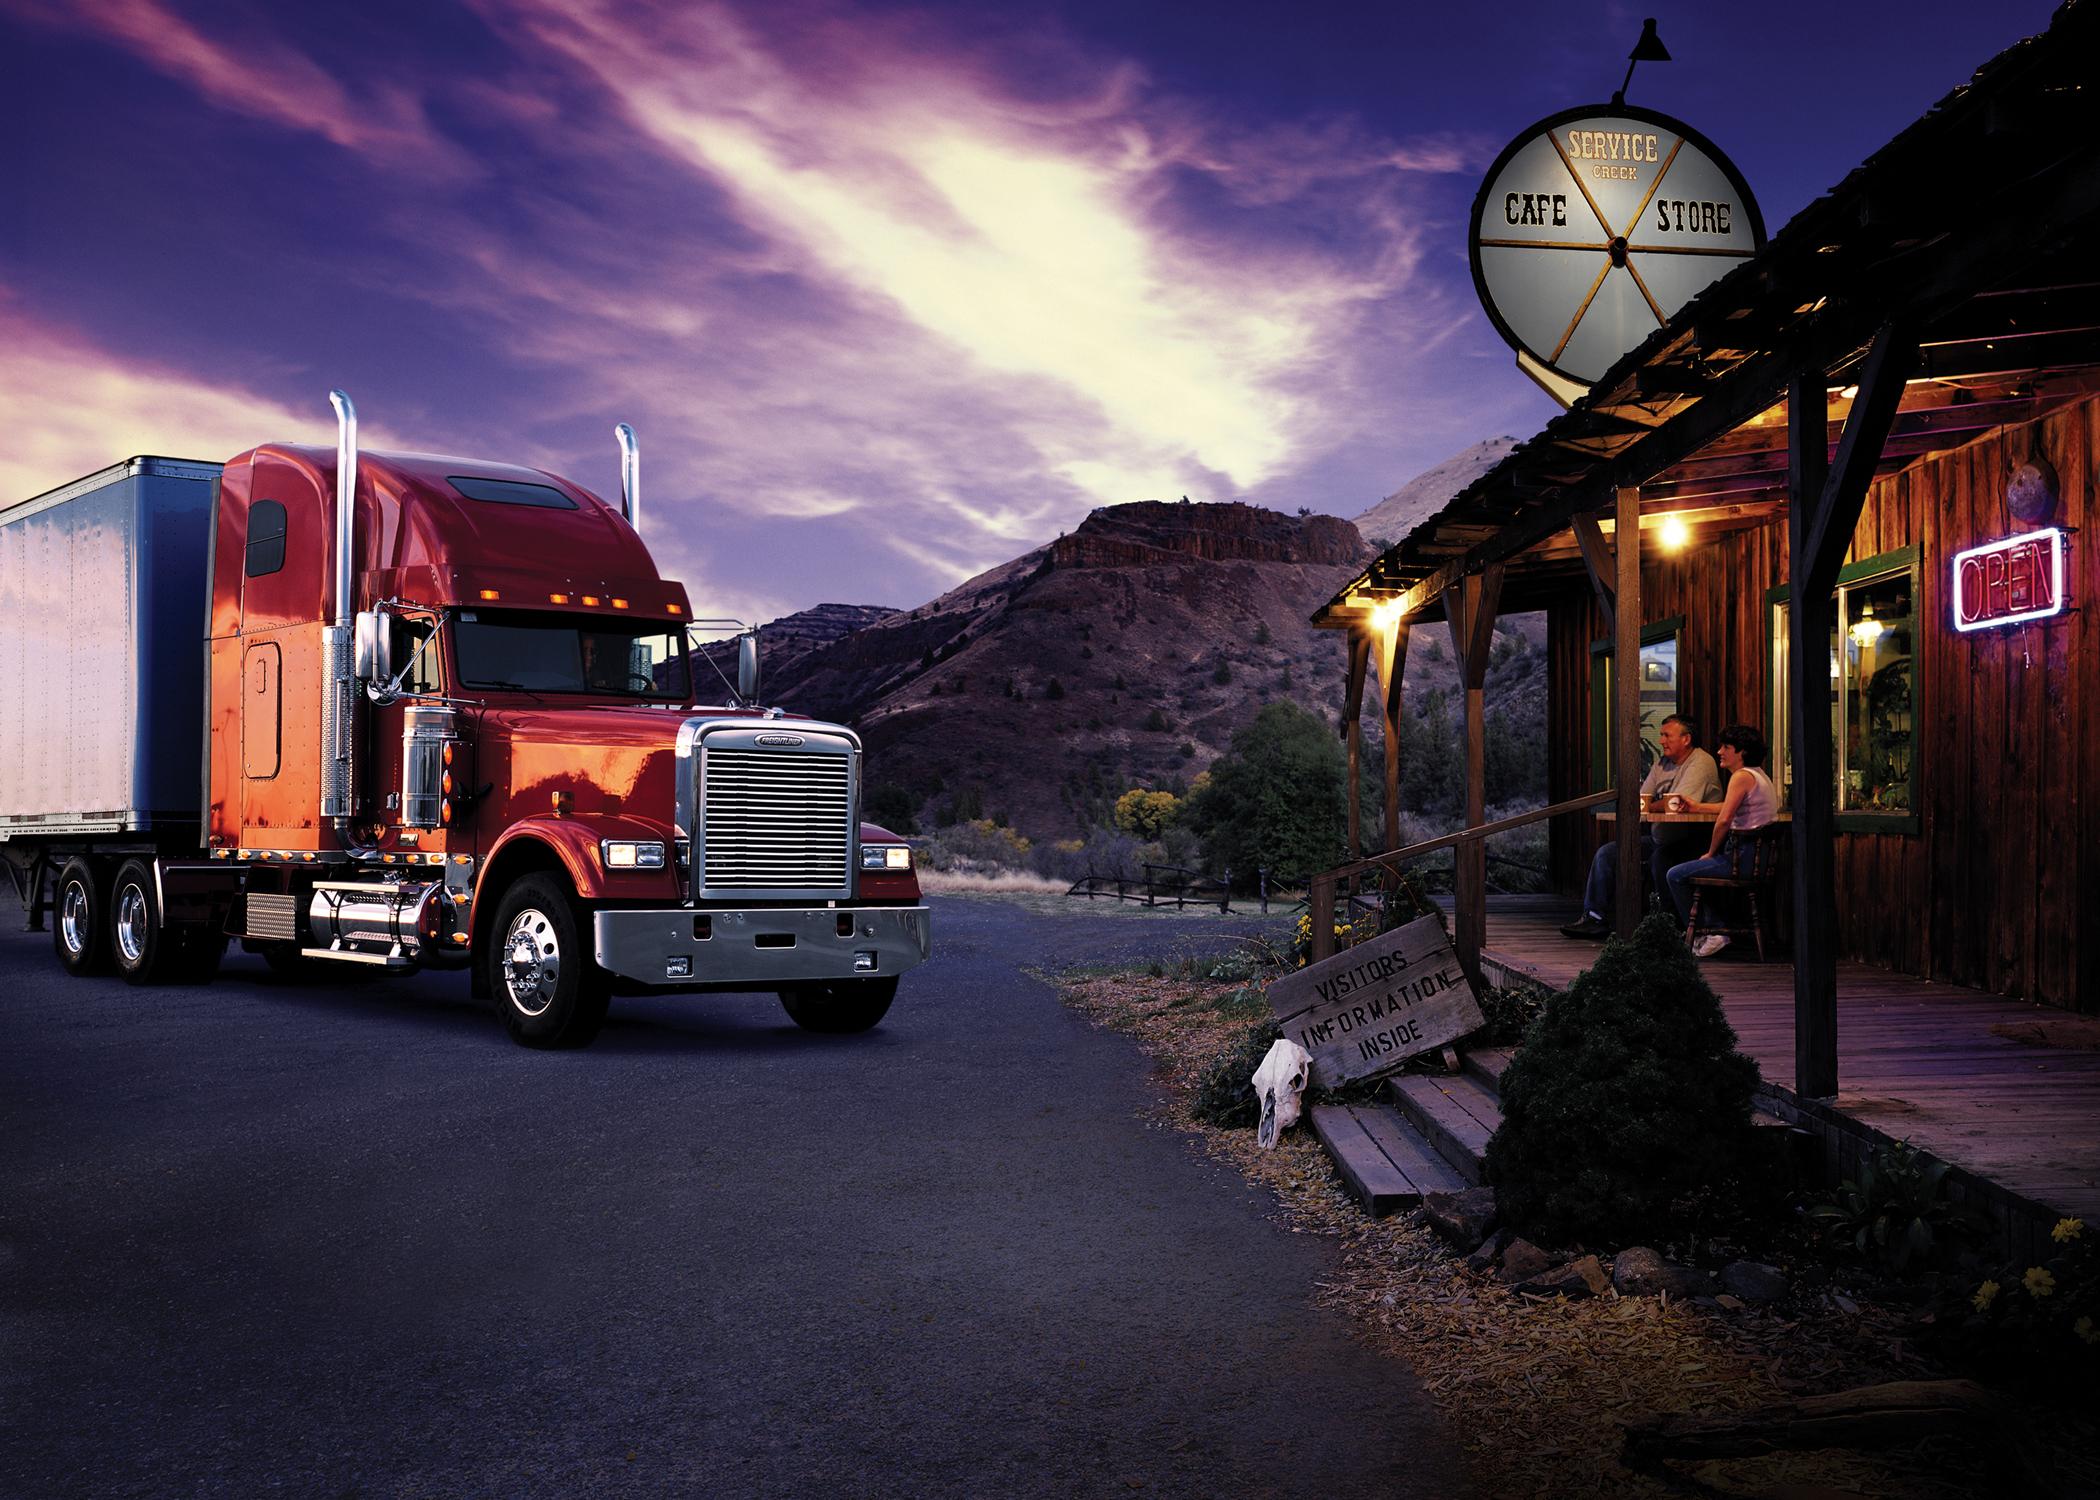 Freightliner semi tractor trucks wallpaper 2100x1500 2100x1500